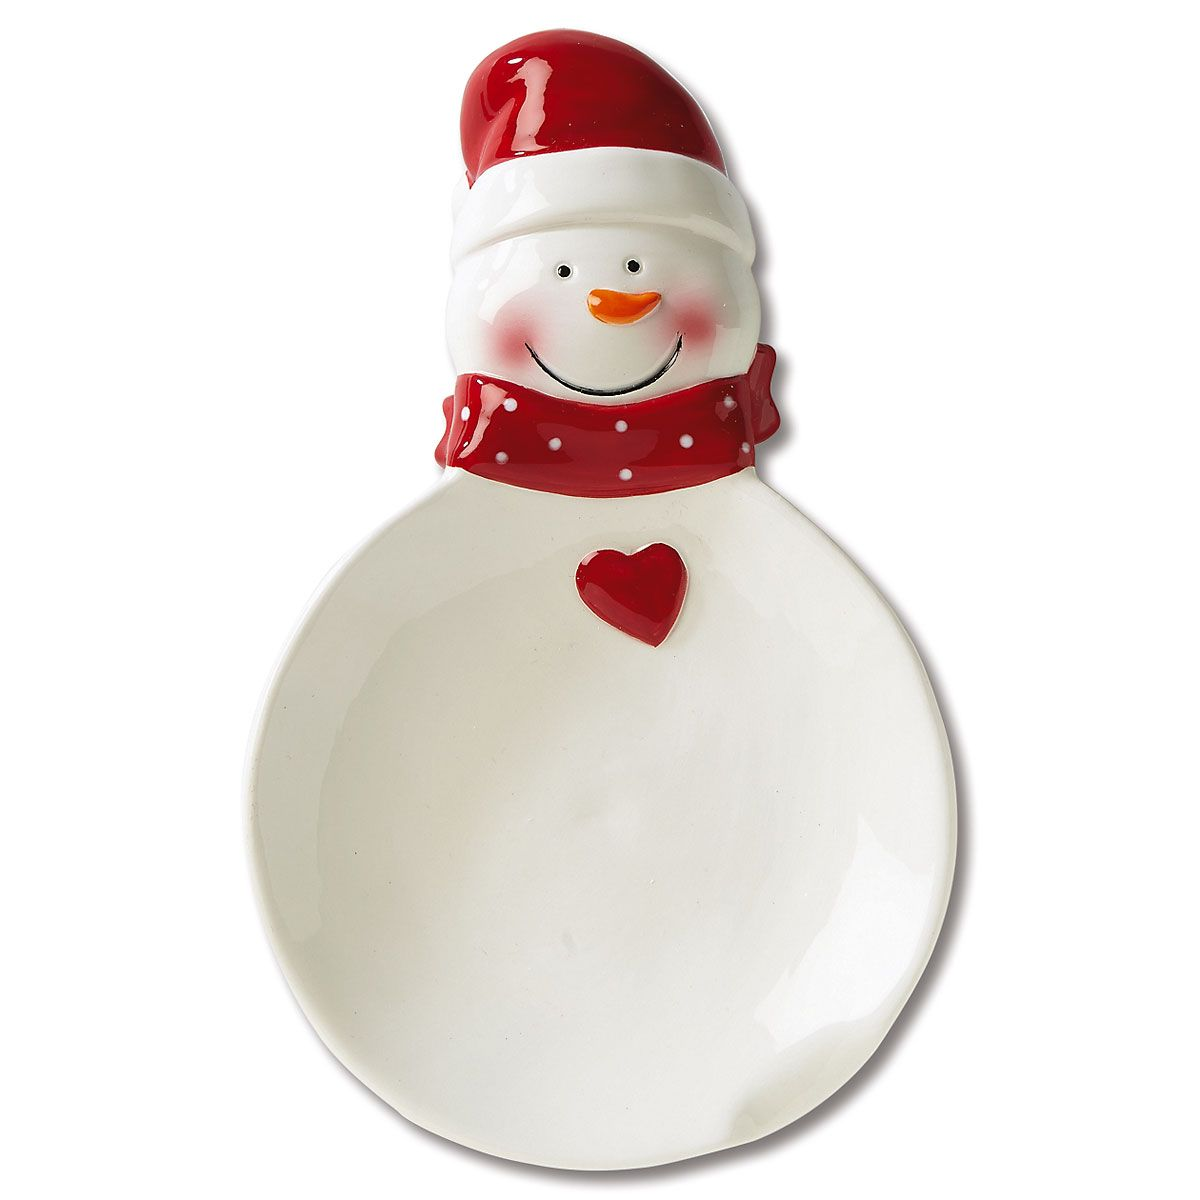 Snowman Spoon Rest – Buy 1 Get 1 Free